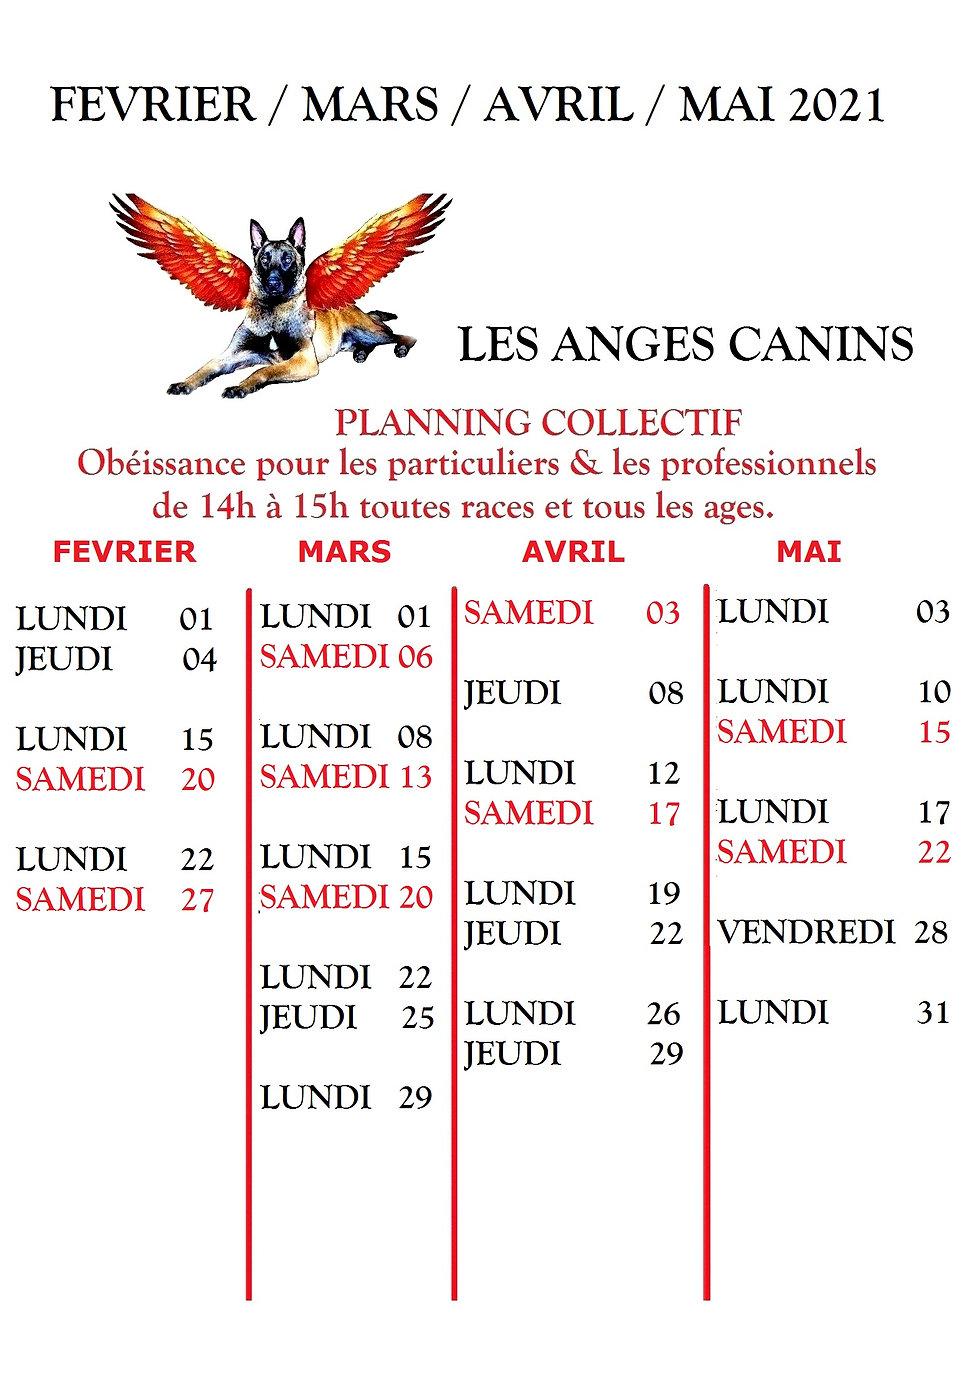 planning  FEV MARS AVRIL MAI   2021.jpg